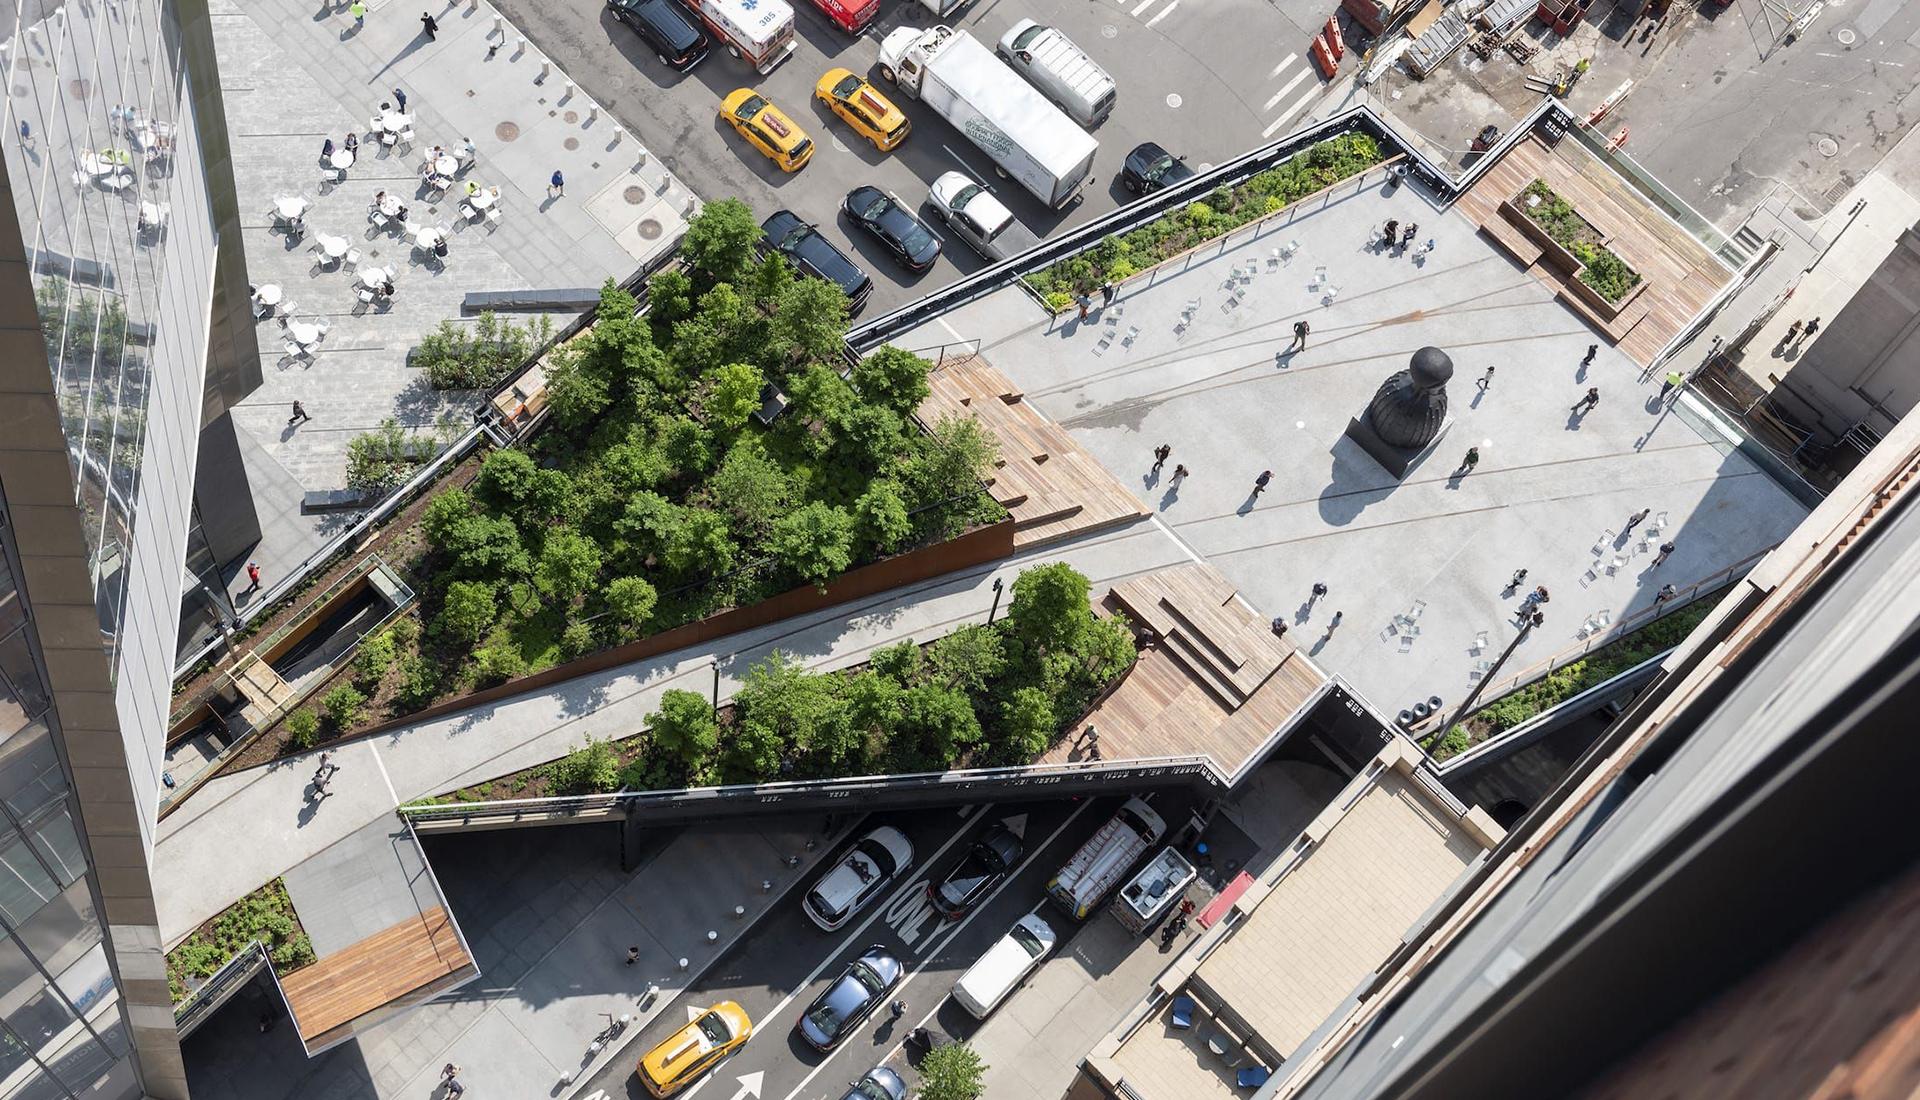 Diller Scofidio + Renfro: завершение парка The High Line